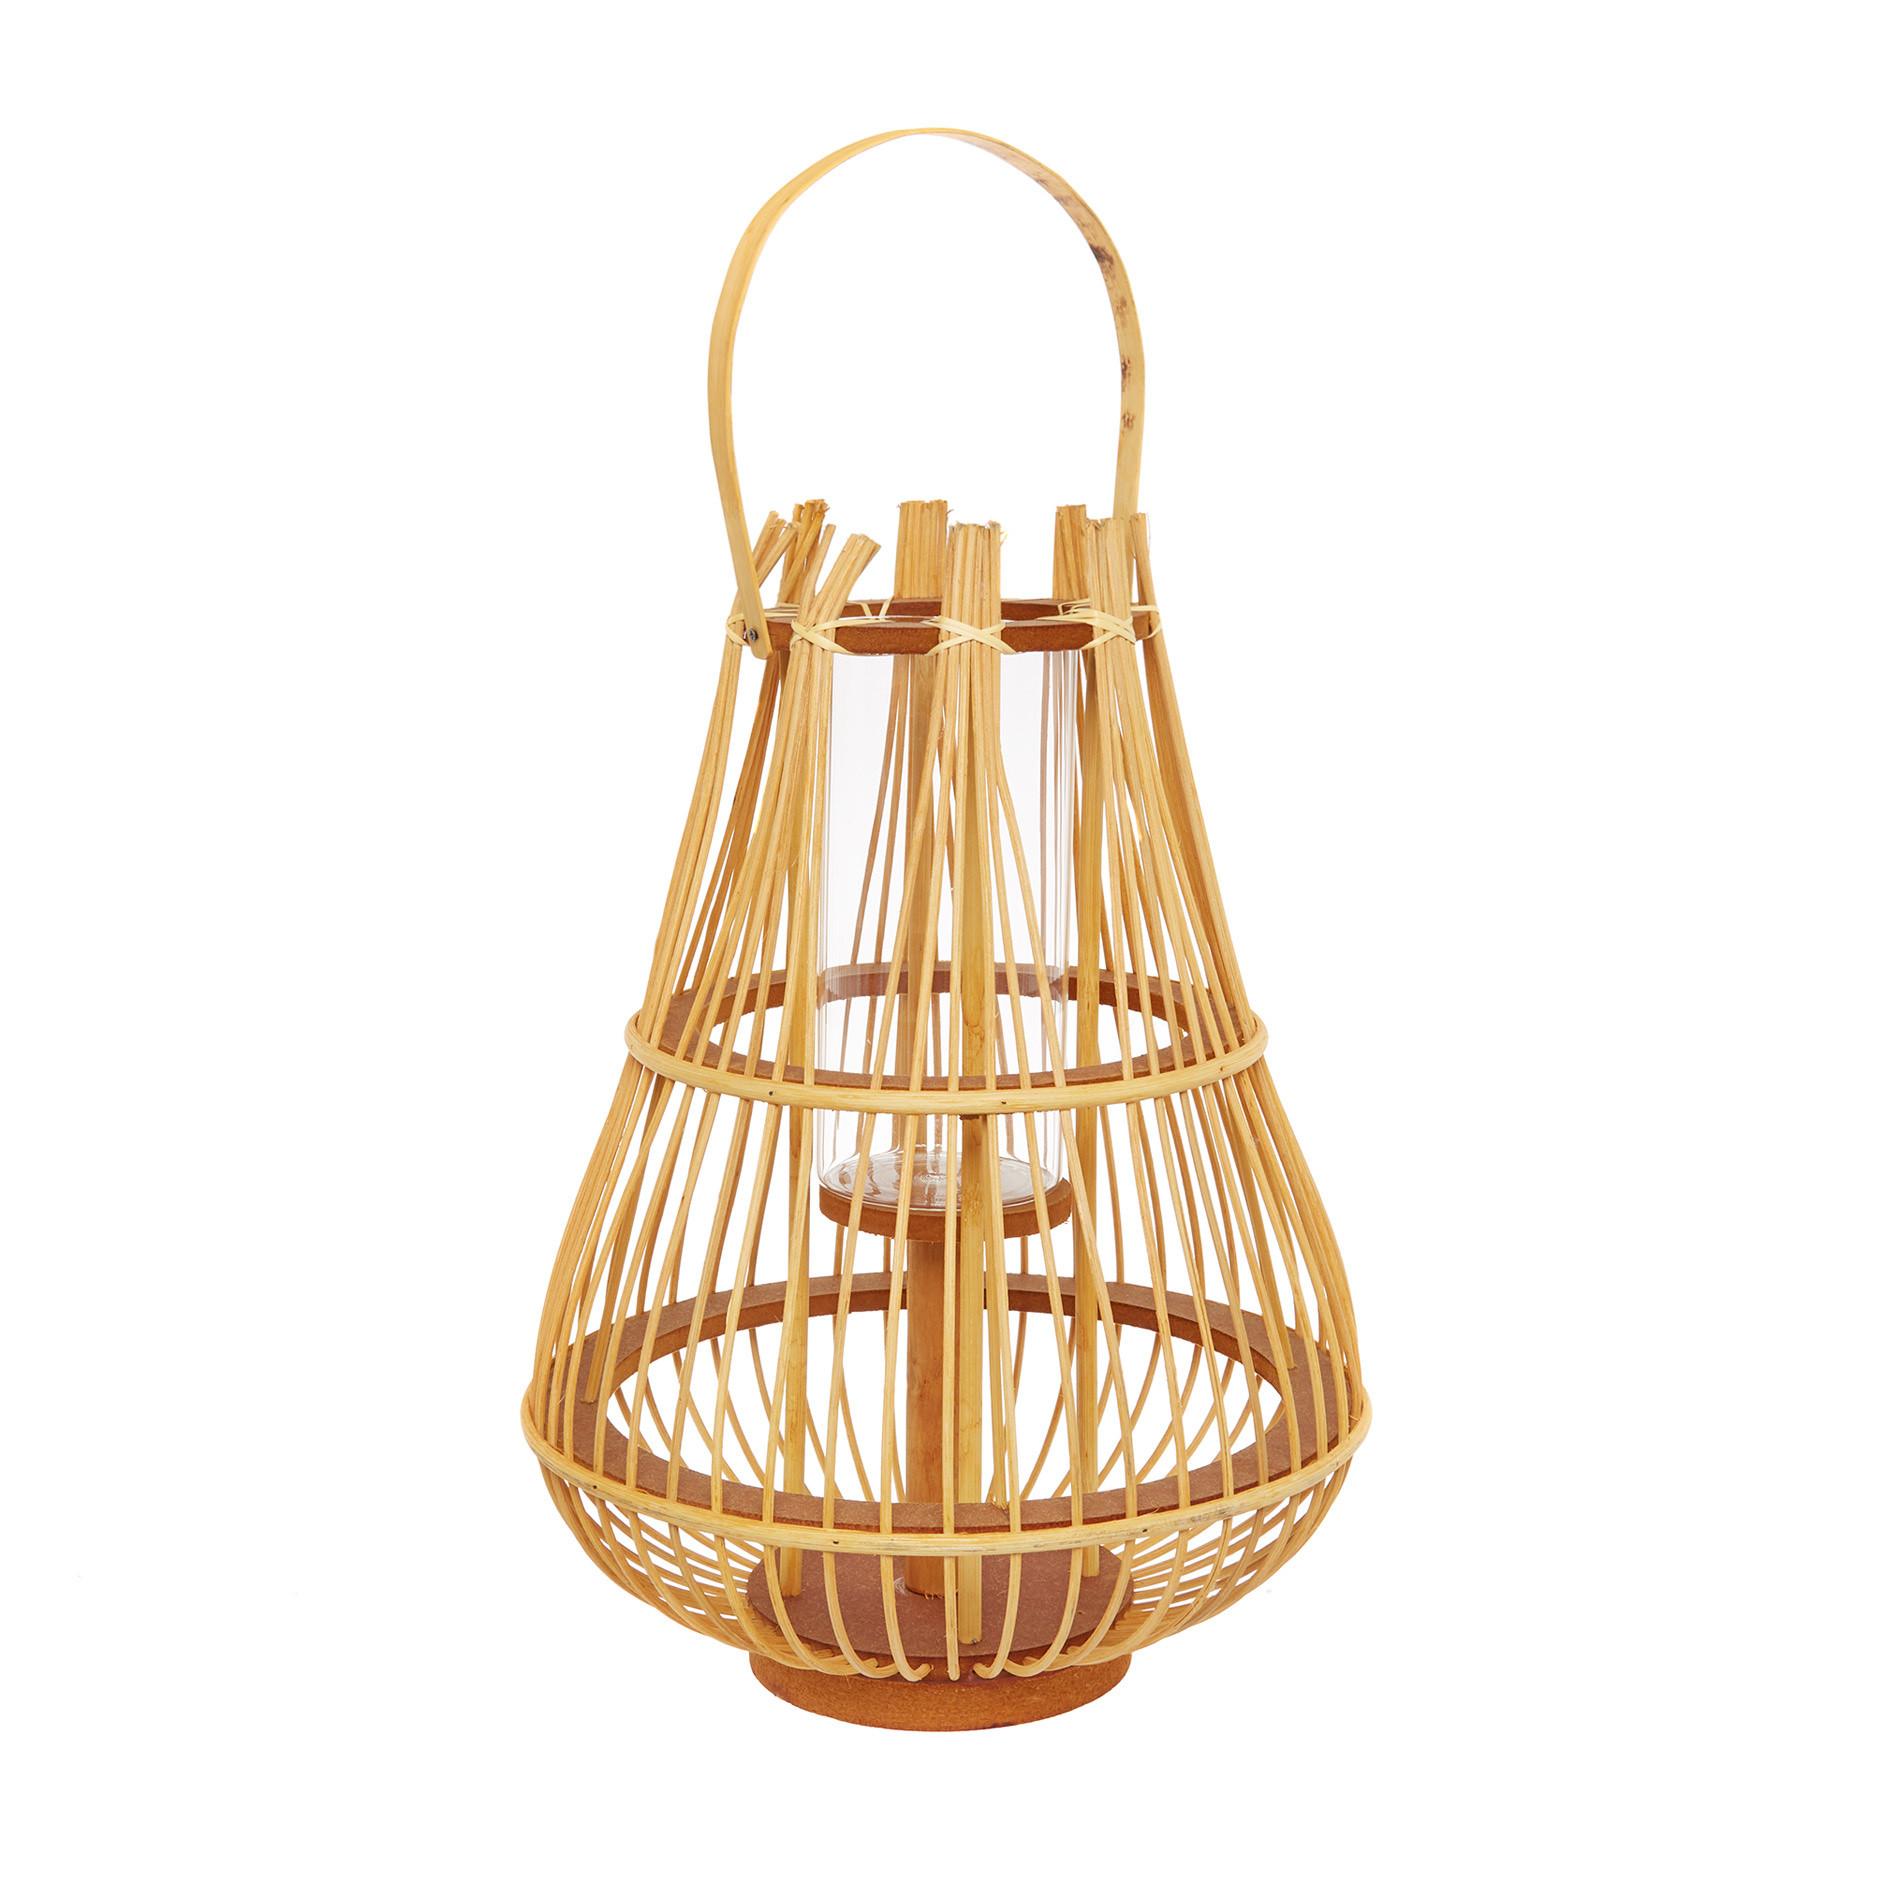 Lanterna bamboo intrecciato a mano, Trasparente, large image number 0